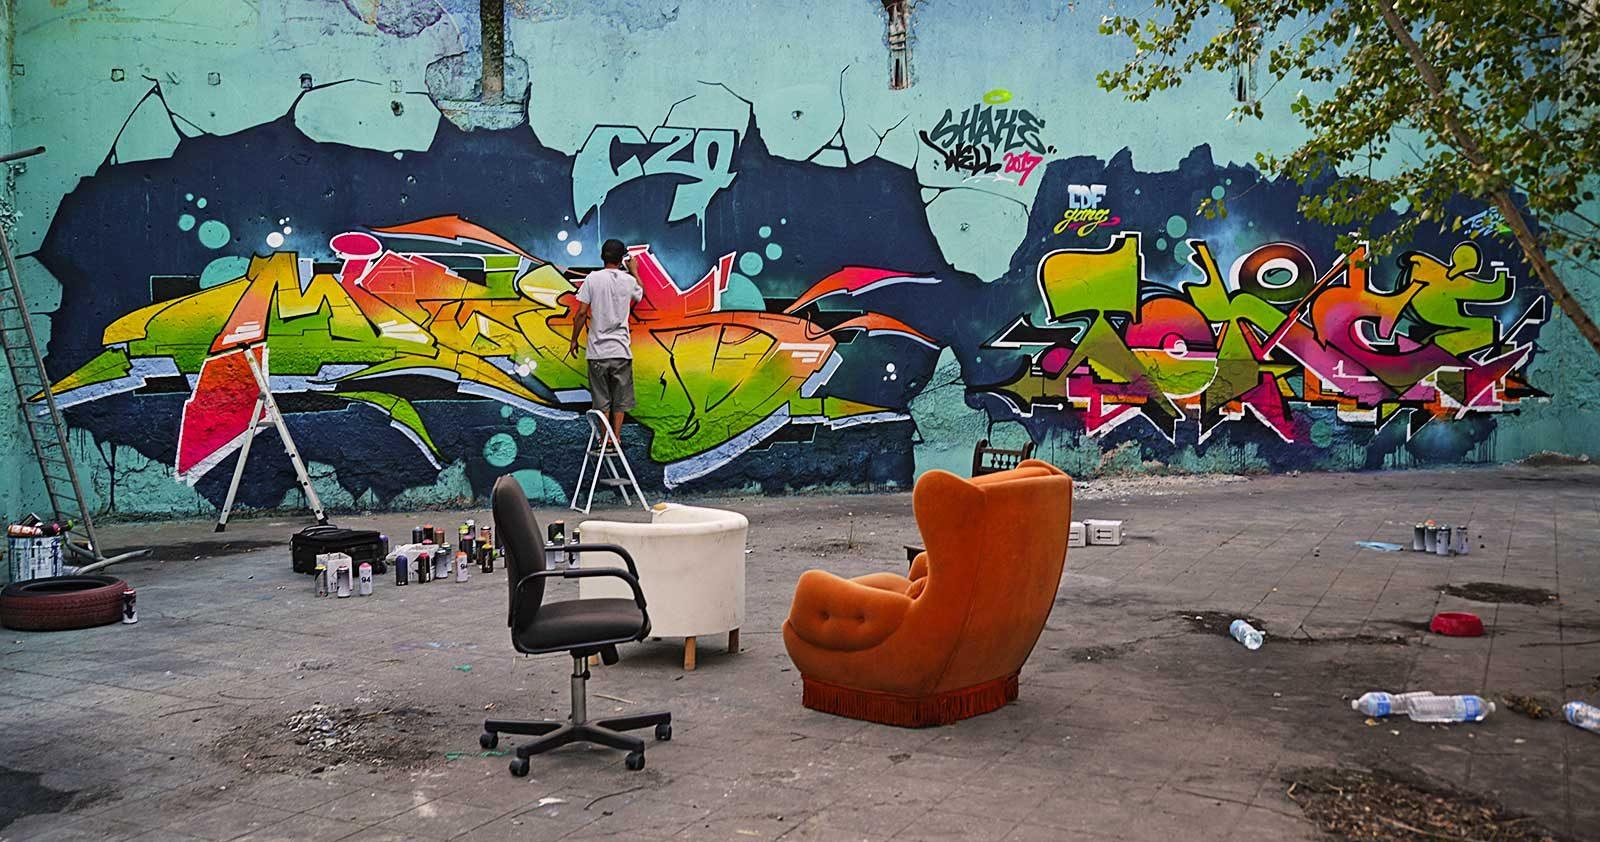 Quand le Shake Well Festival secoue le Graffiti bordelais